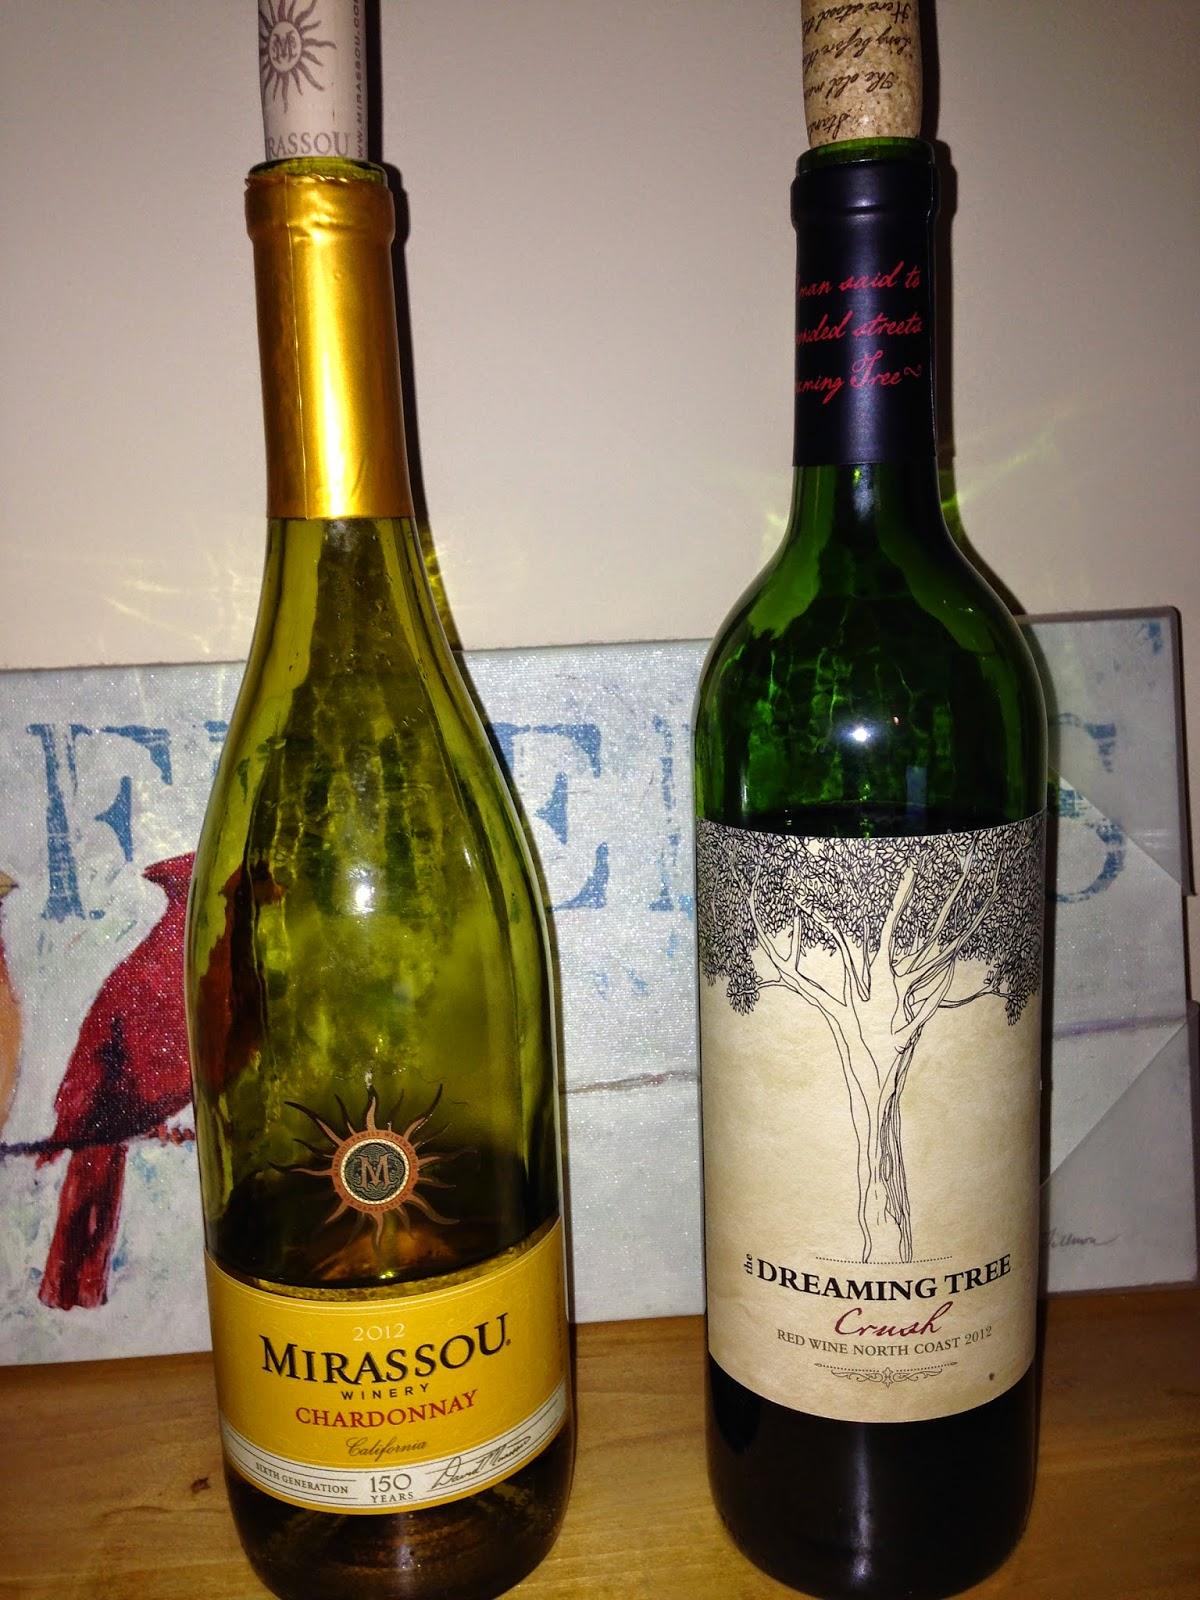 Mirassou Chardonnay Dreaming Tree